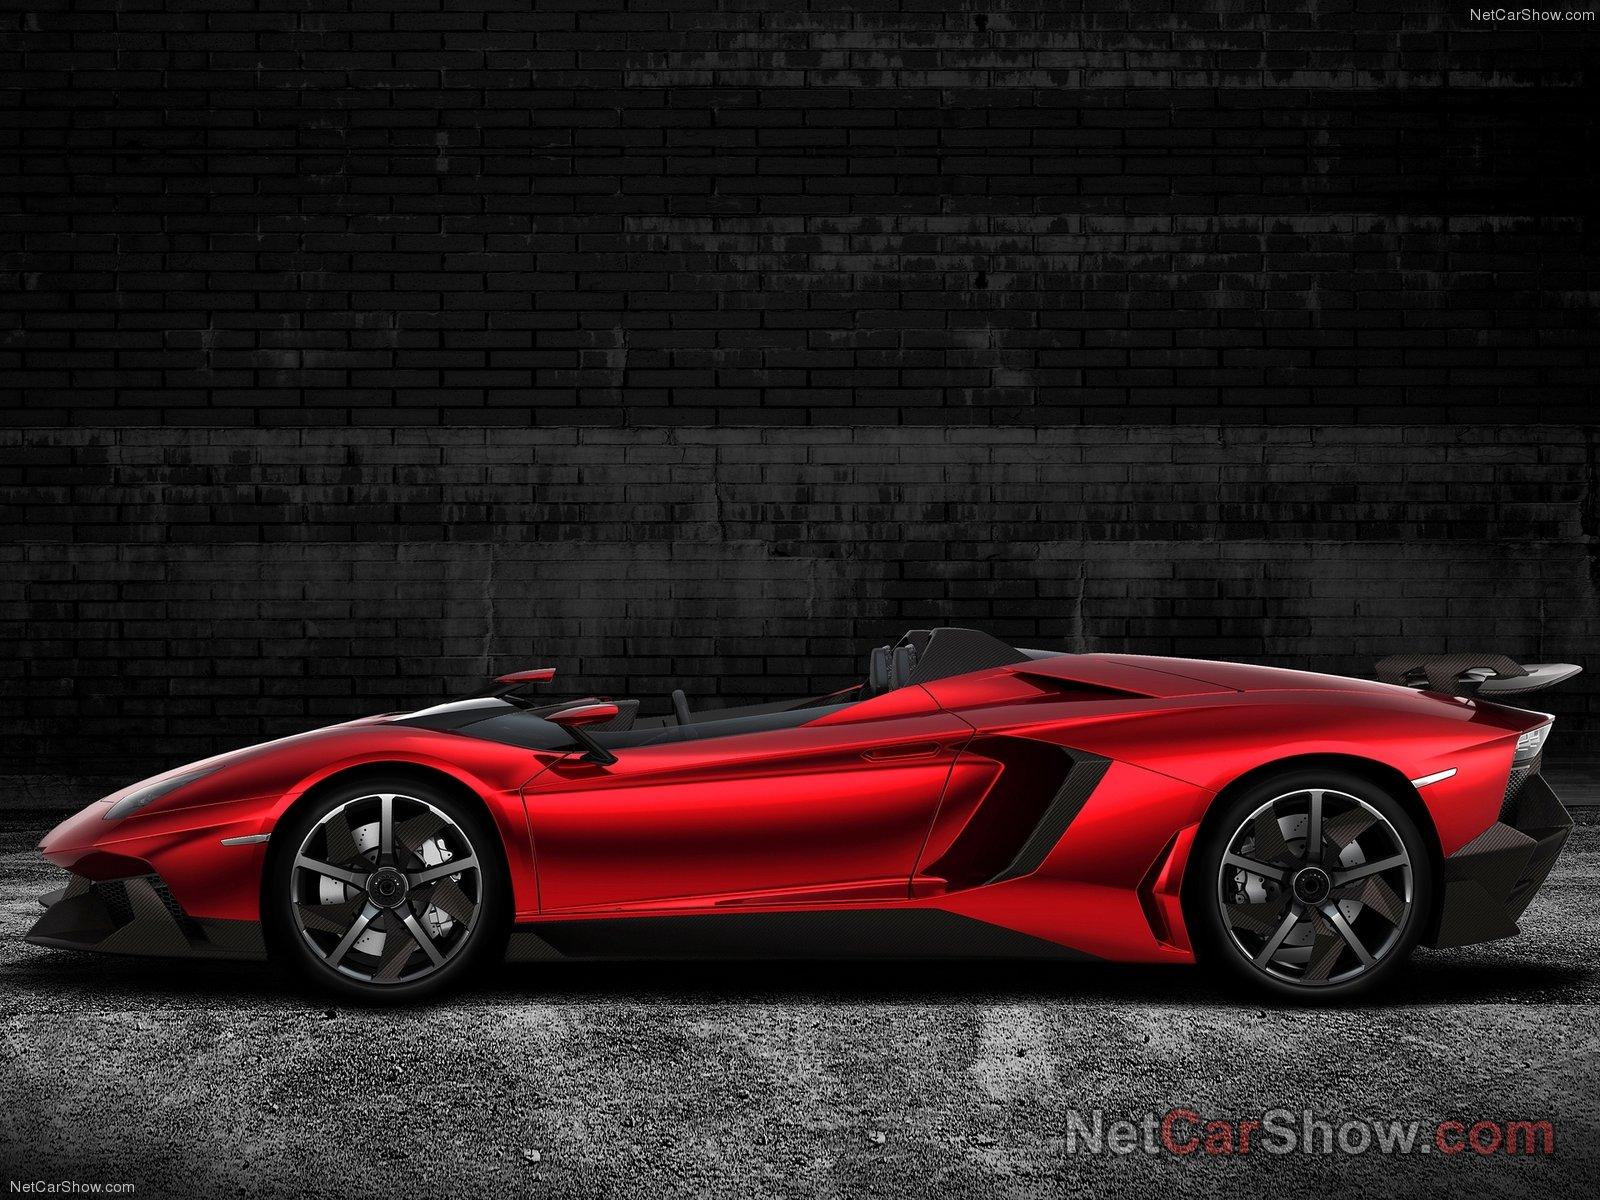 Lamborghini Aventador J Concept 2012 Cars Modifications